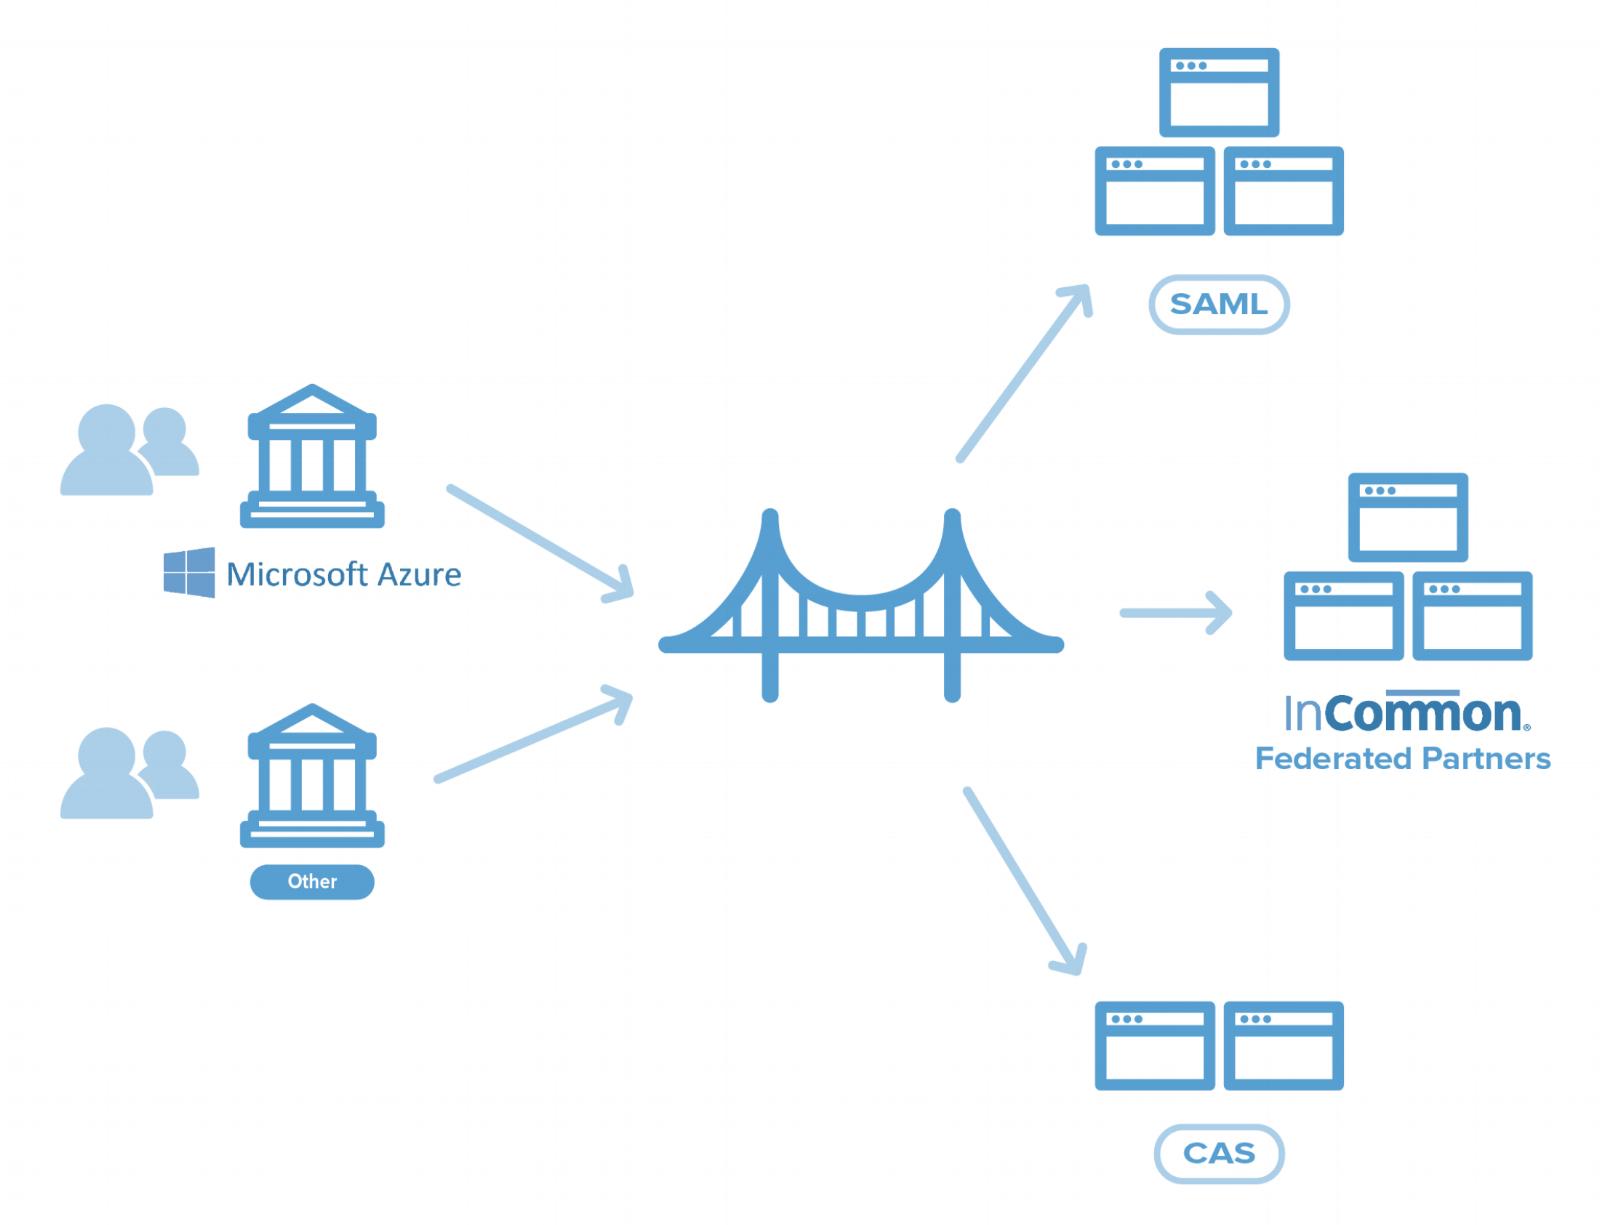 Cirrus+Identity+Product+Bridge+Infographic.png